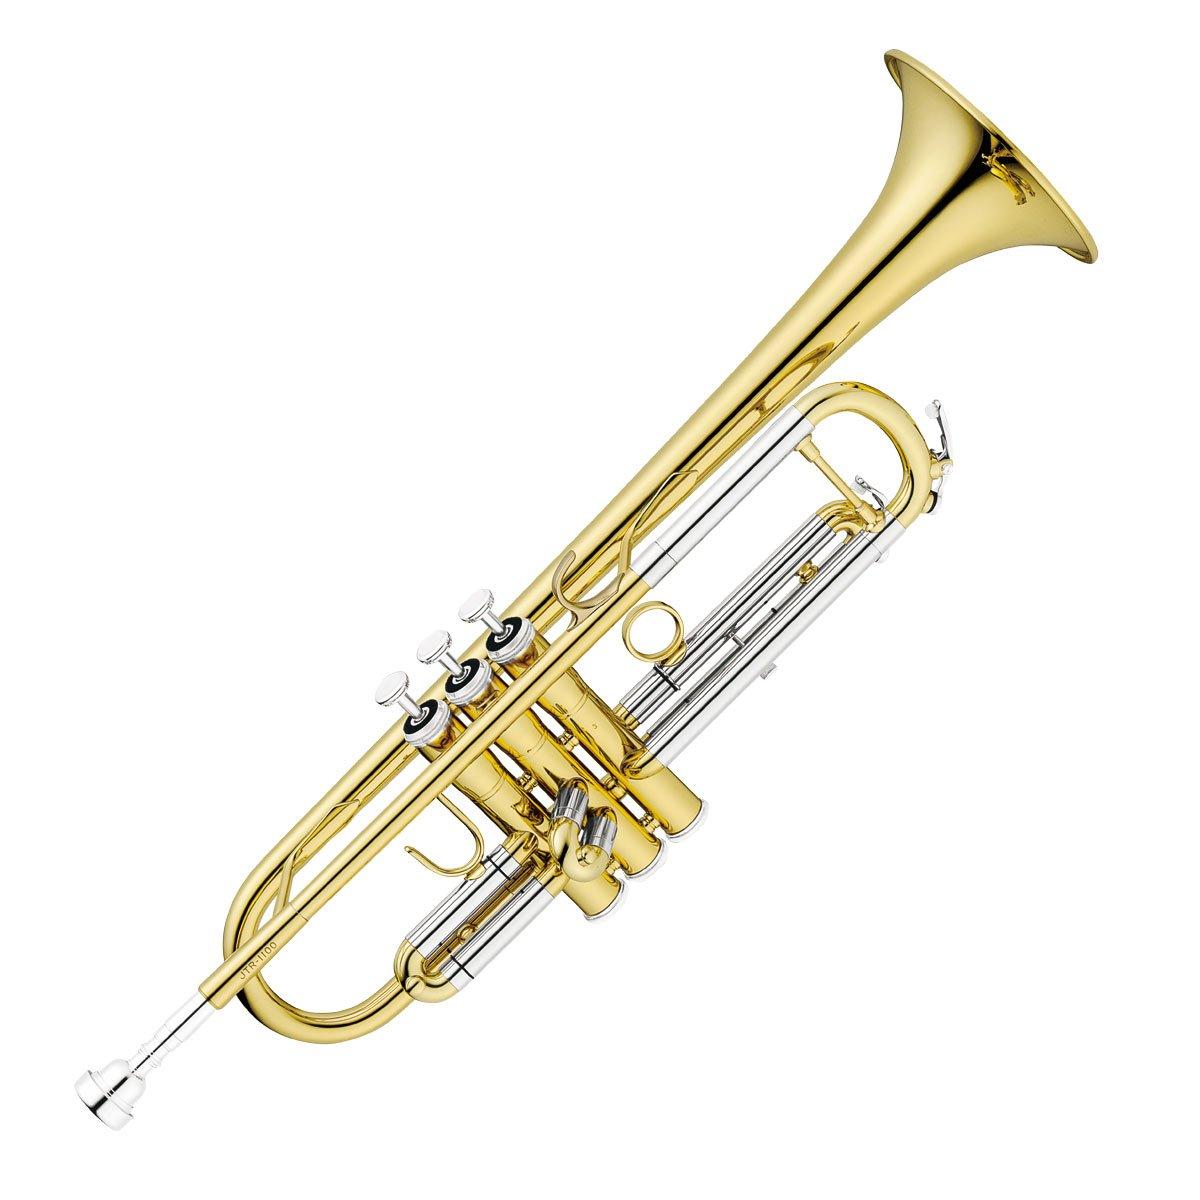 JUPITER / JTR-1100 ジュピター B♭ Trumpet トランペット プロシリーズ ラッカー仕上げ 《お取り寄せ》